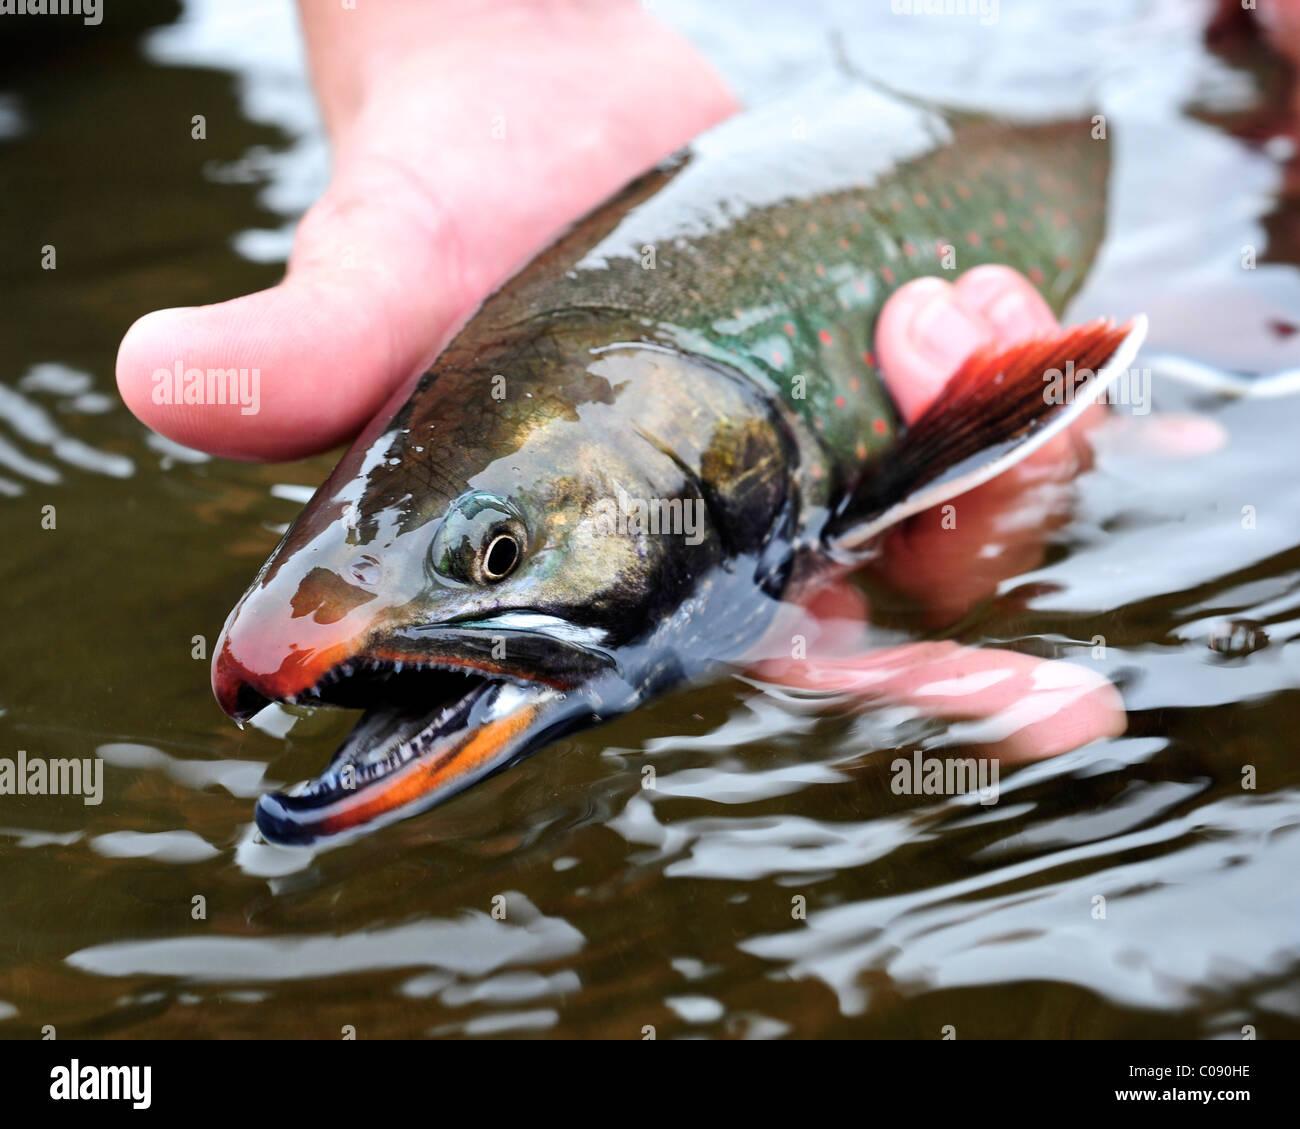 Cerca de una persona mantenga un Dolly Varden char pescaban en Deep Creek, la Península Kenai, Southcentral Imagen De Stock